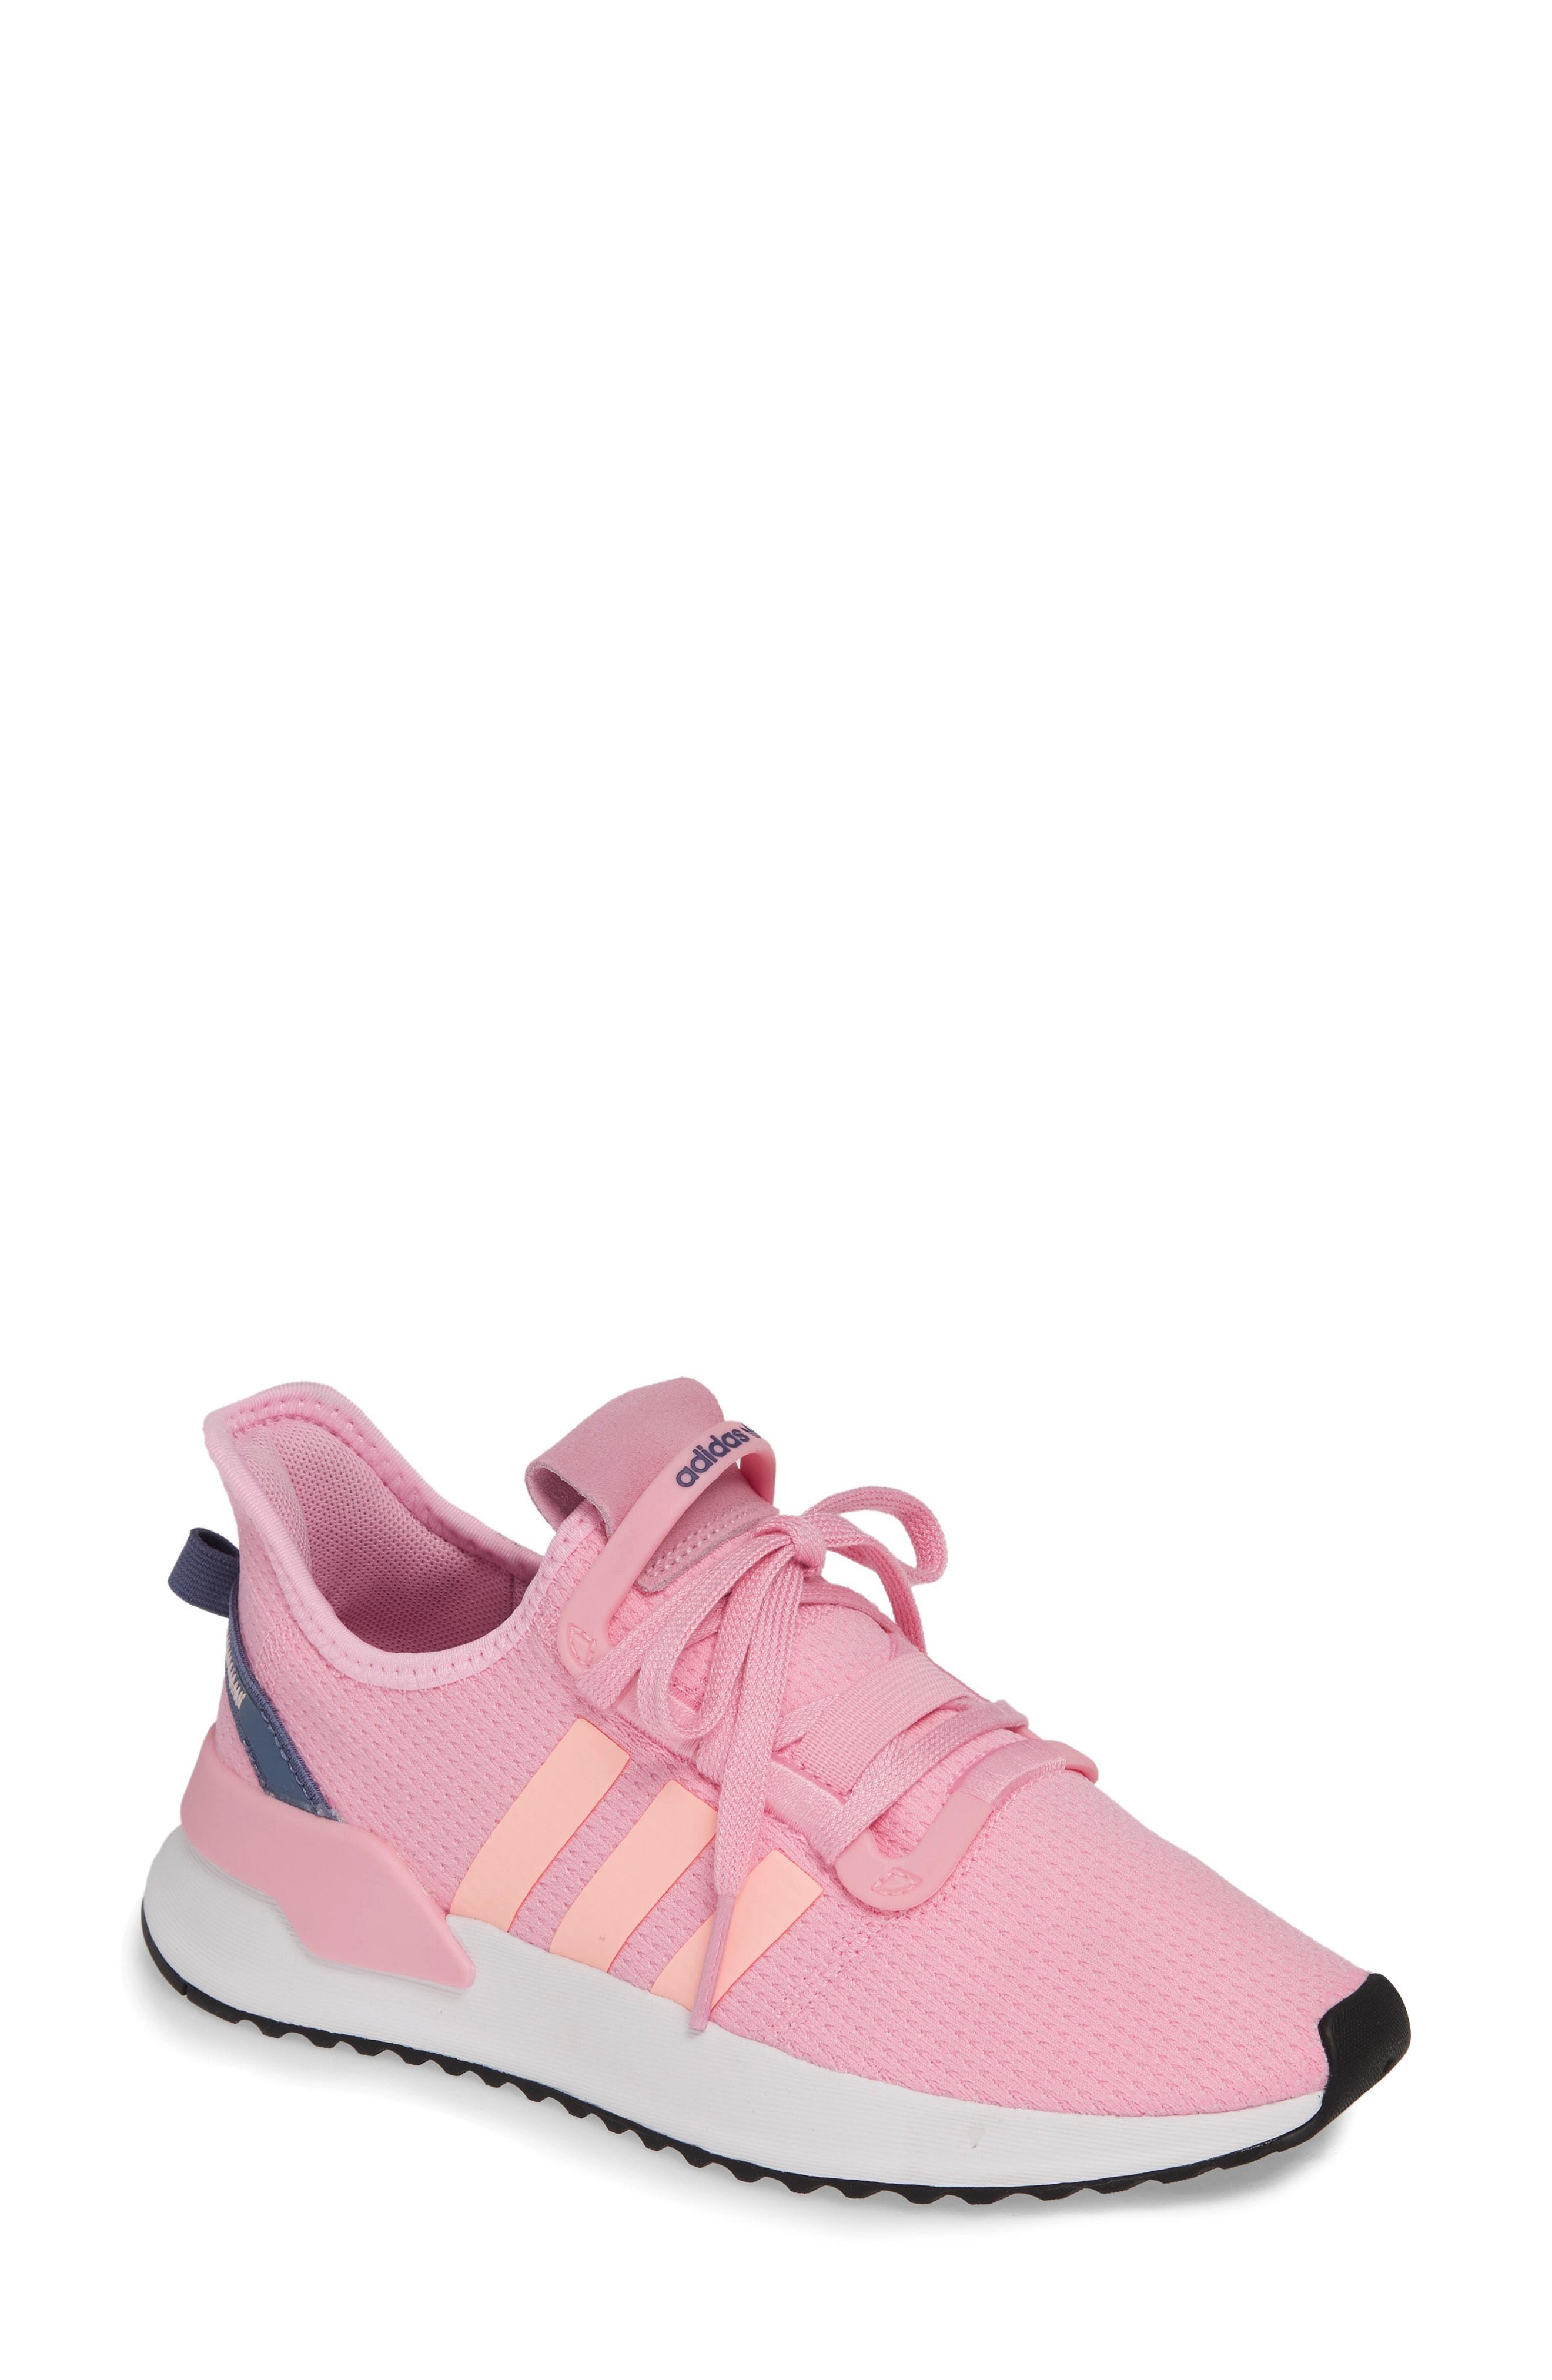 premium selection 5ea05 77905 Lyst - adidas U-path Run Sneaker